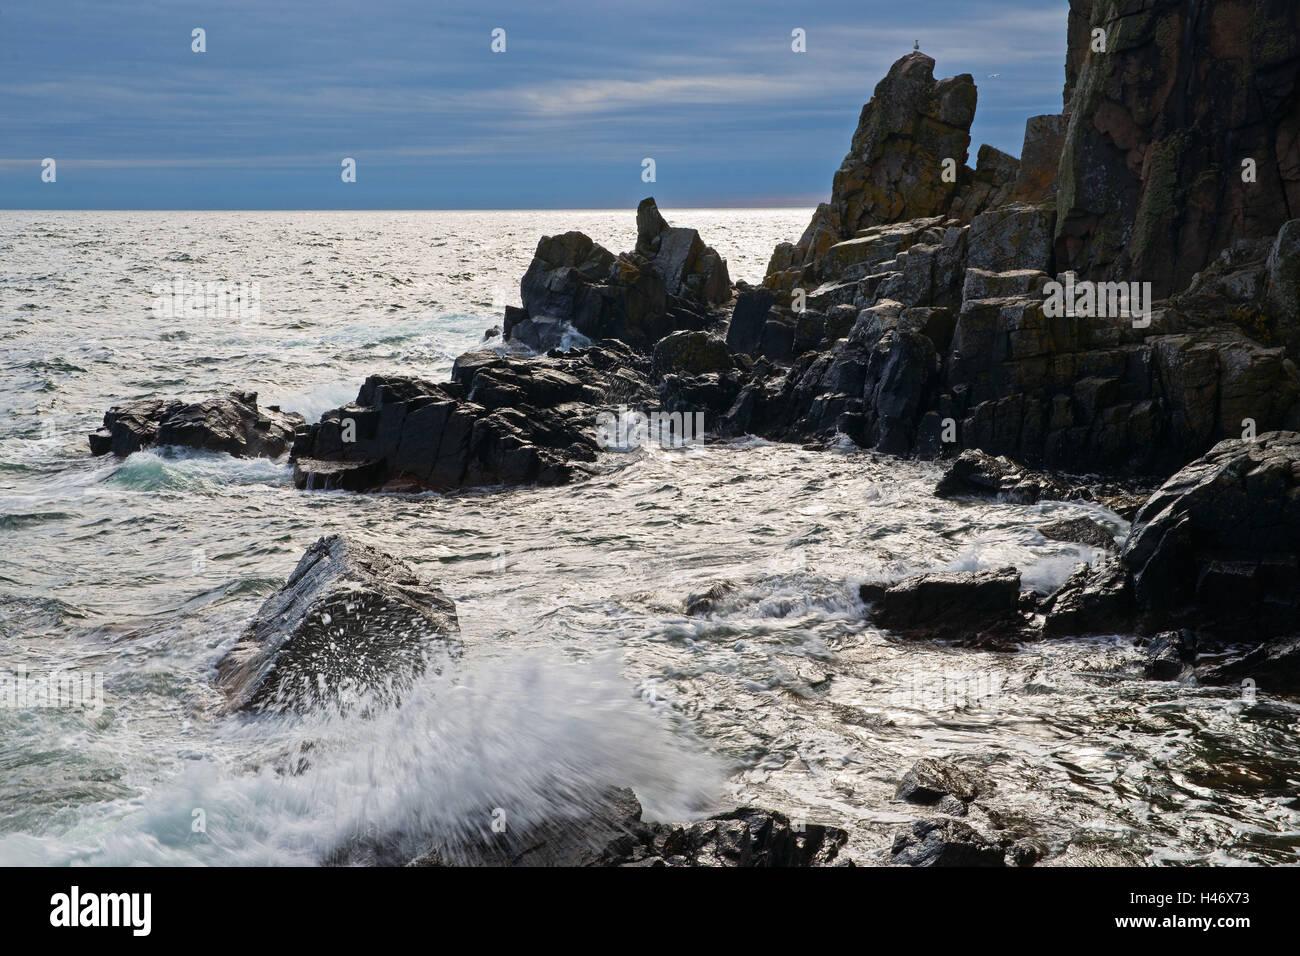 Denmark, Bornholm, sea, bile coast, - Stock Image